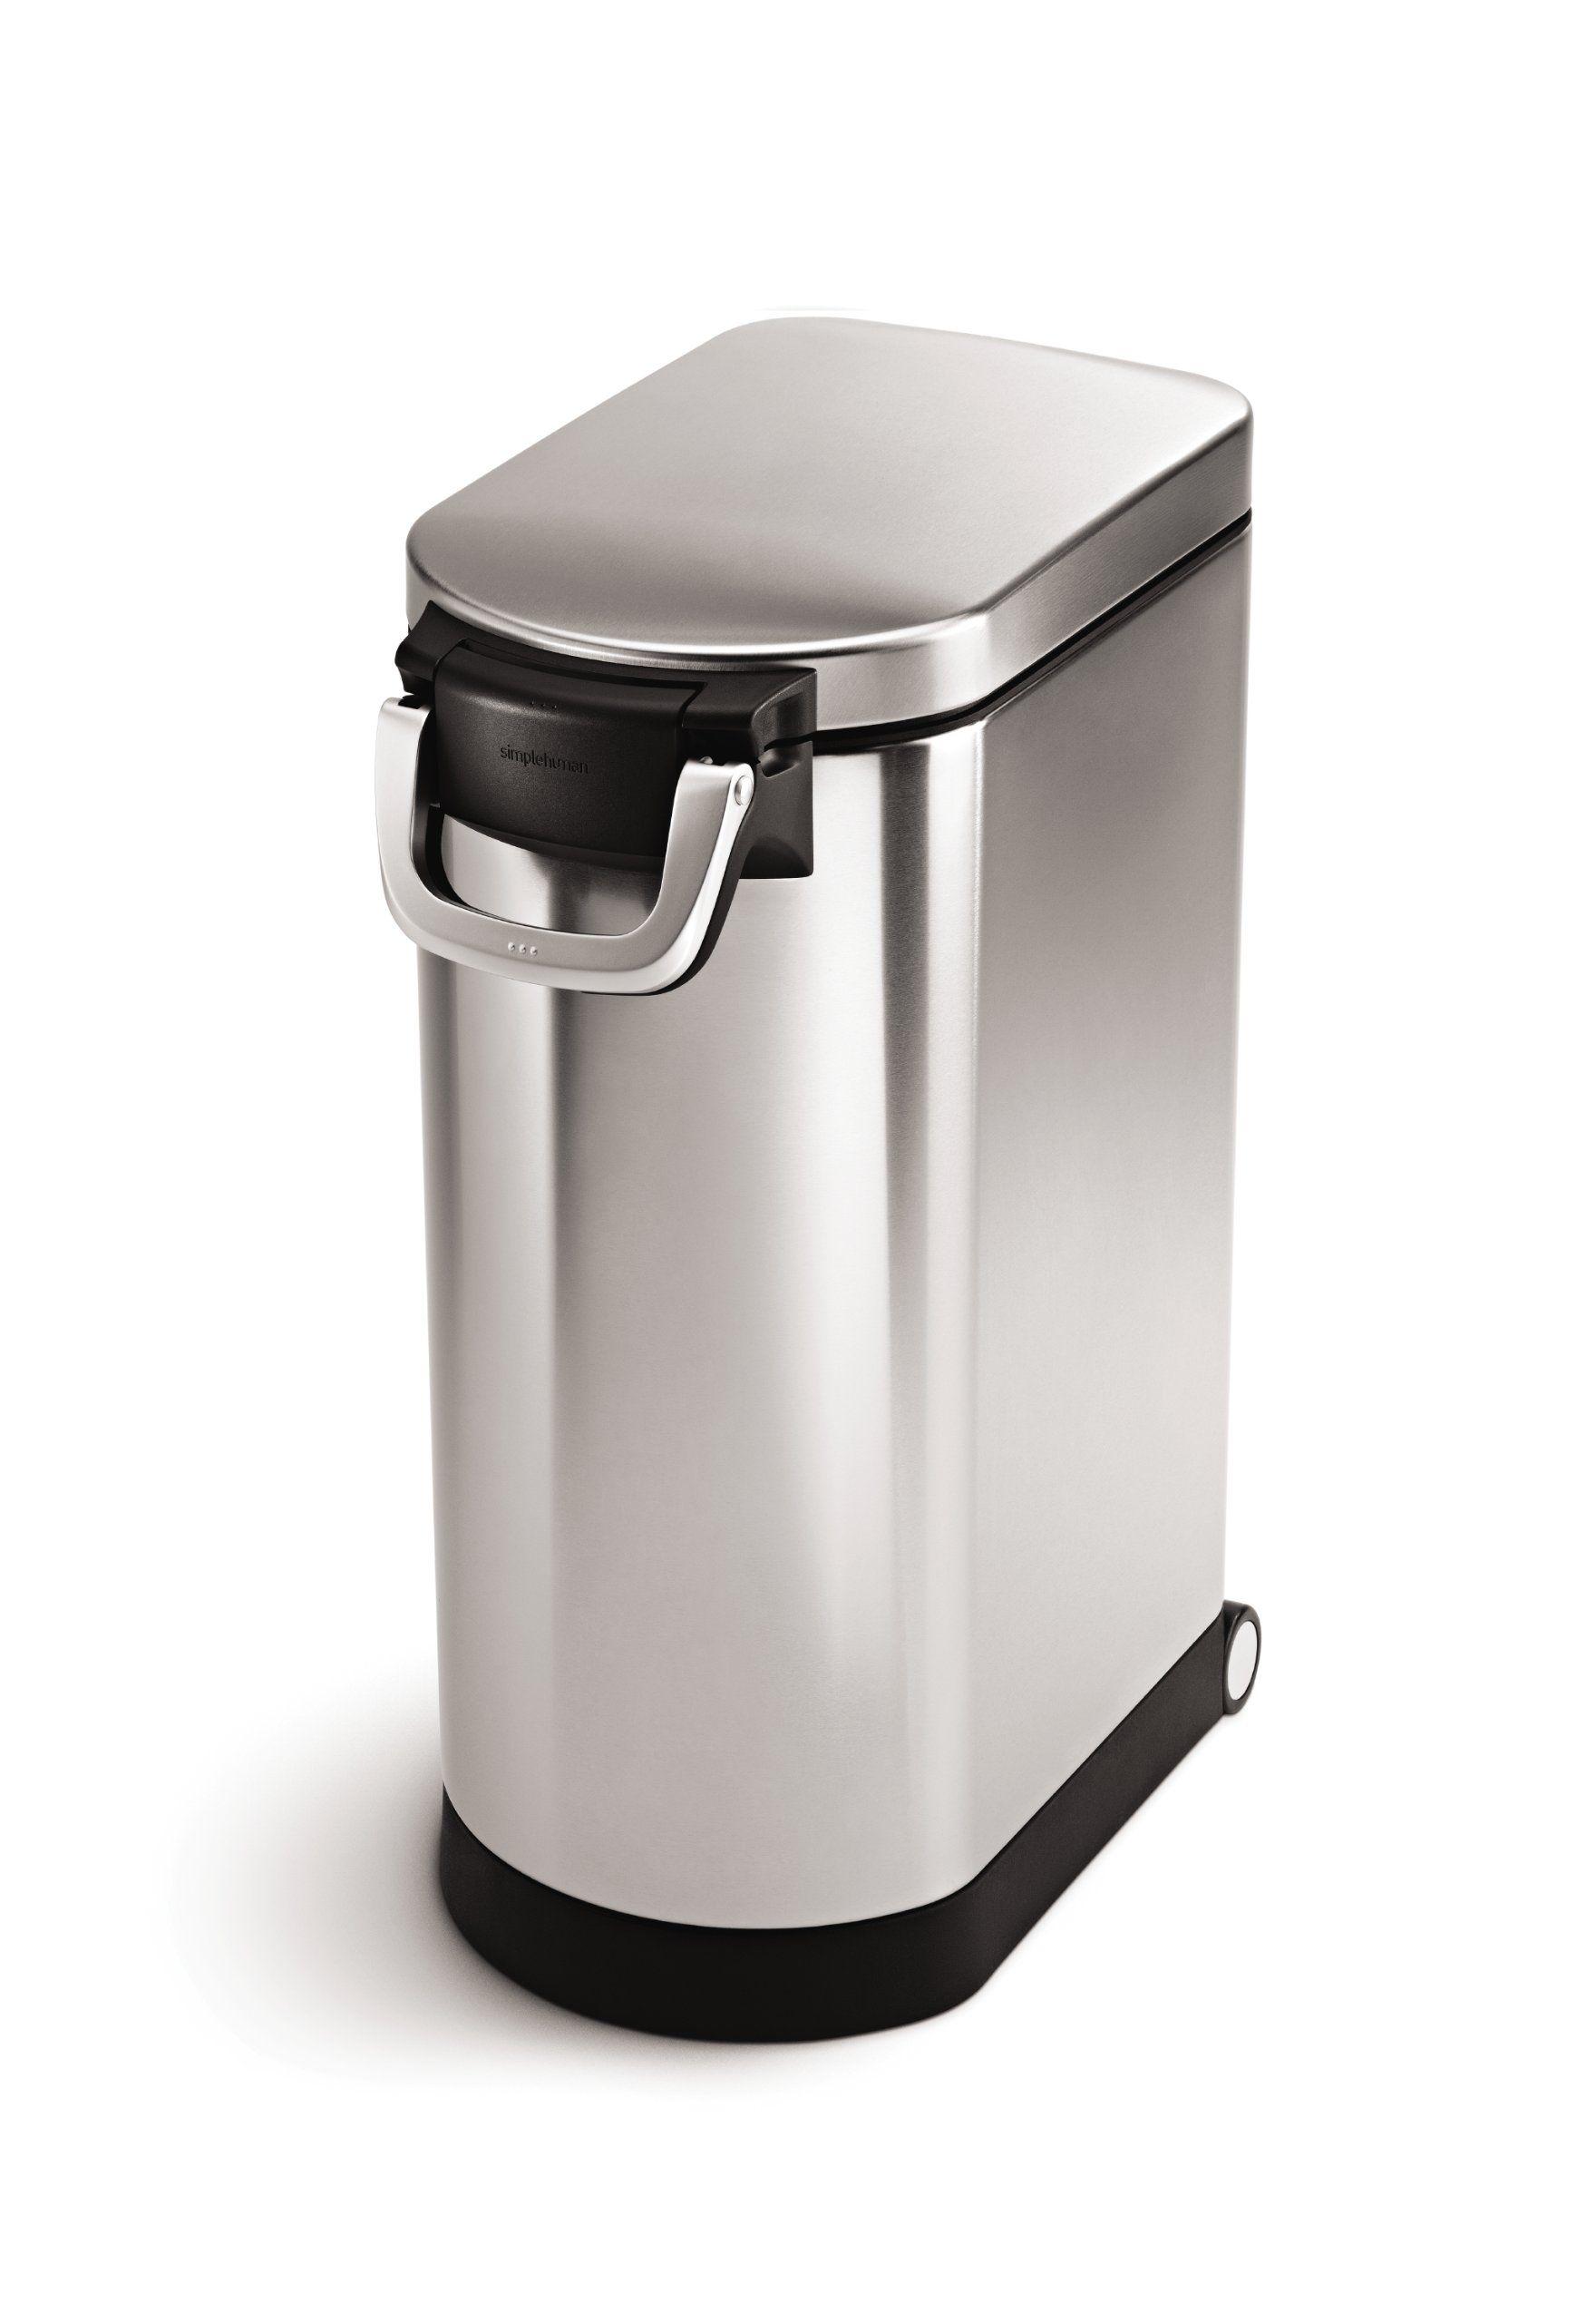 Amazon Com Simplehuman Medium Pet Food Storage Can Brushed Stainless Steel 25 L 27 Lb 1 Dog Food Storage Containers Pet Food Container Dog Food Container